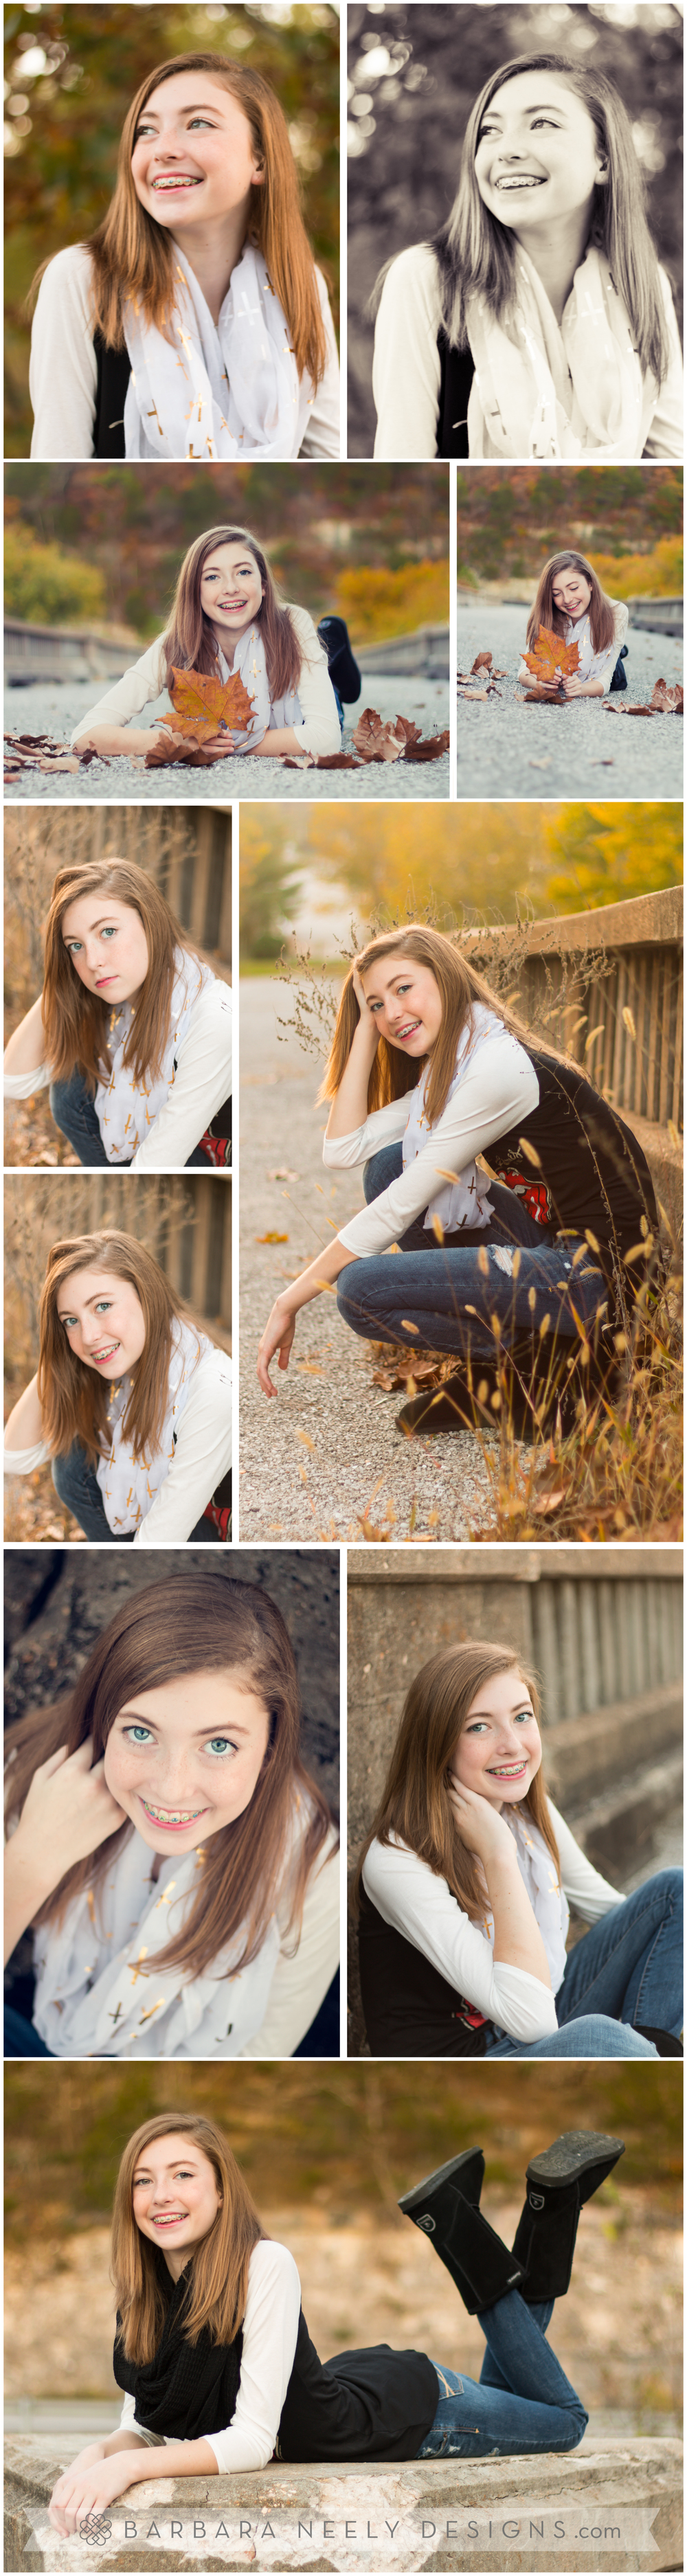 springfield-mo-teen-photographer-Rylee7.jpg